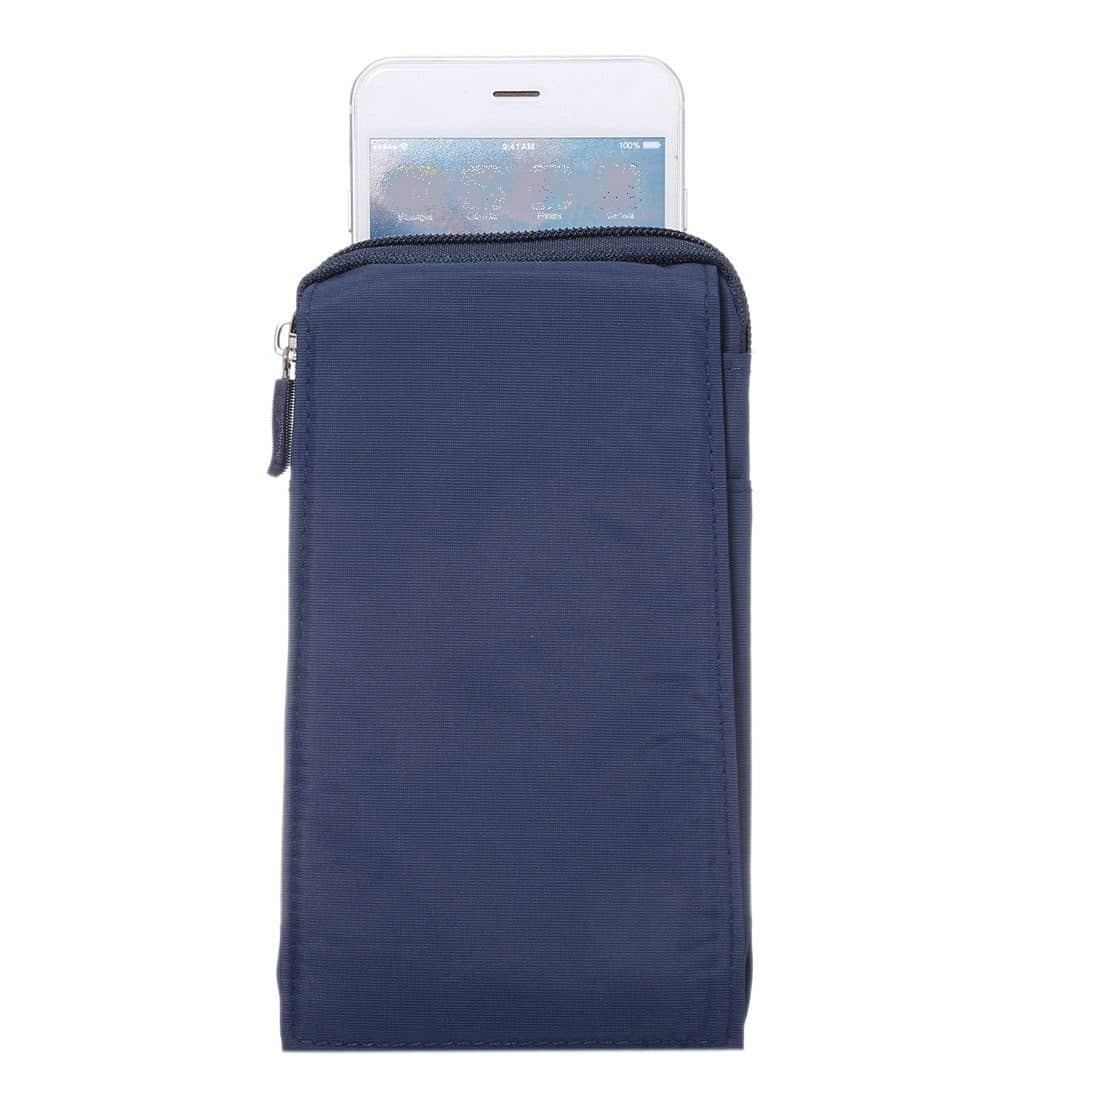 para-ALCATEL-ONE-TOUCH-A3-XL-Funda-Azul-Multiusos-XXM-18x10cm-Cinturon-Universal